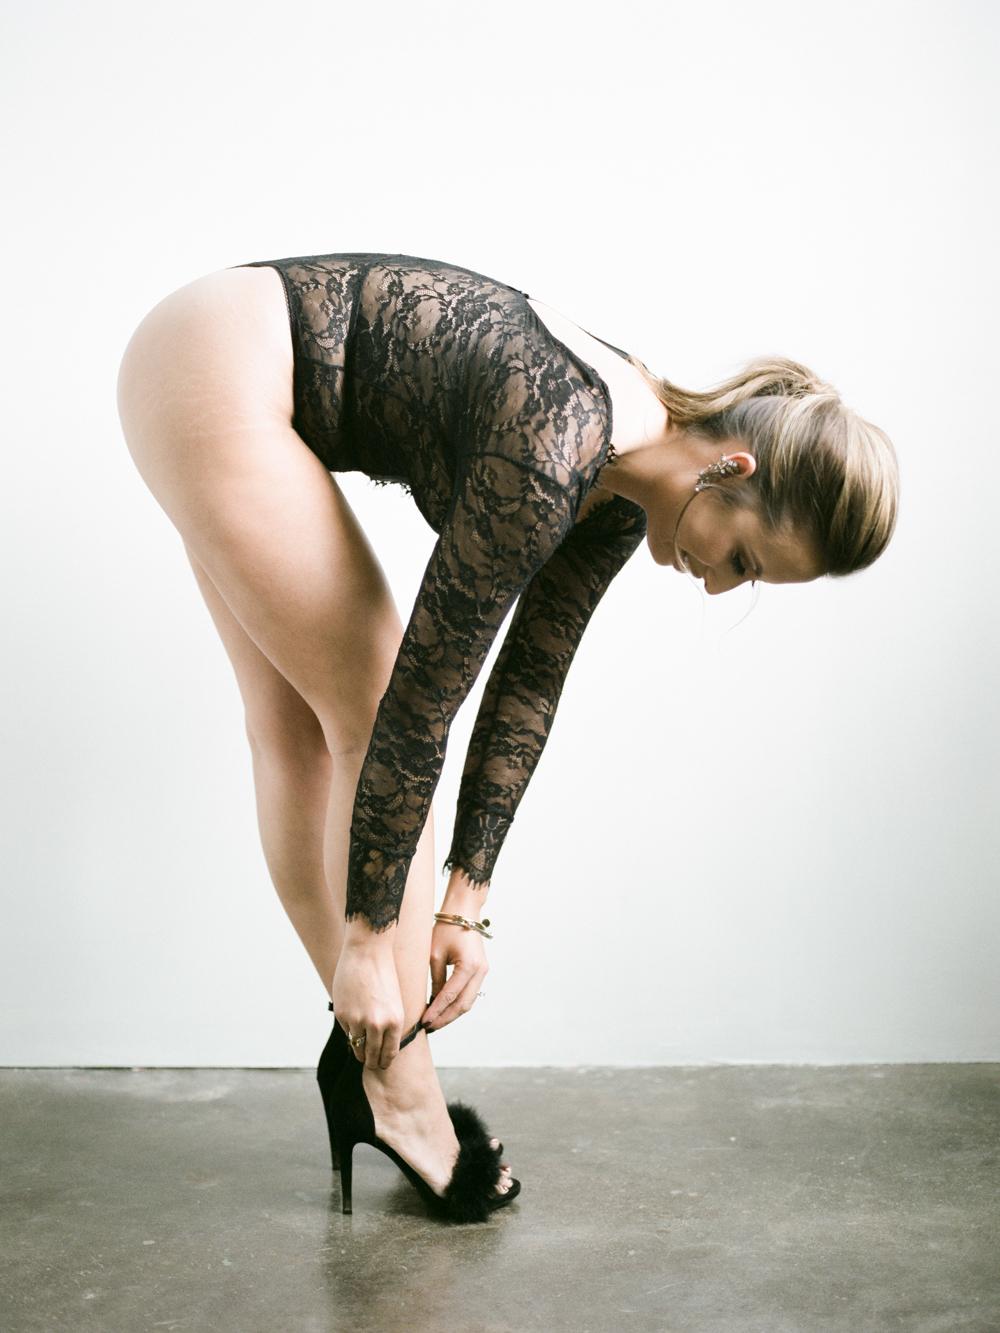 Christine-Gosch-Houston-boudoir-photographer-film-photography-fill-in-the-blank-wedding-photographer-1.jpg